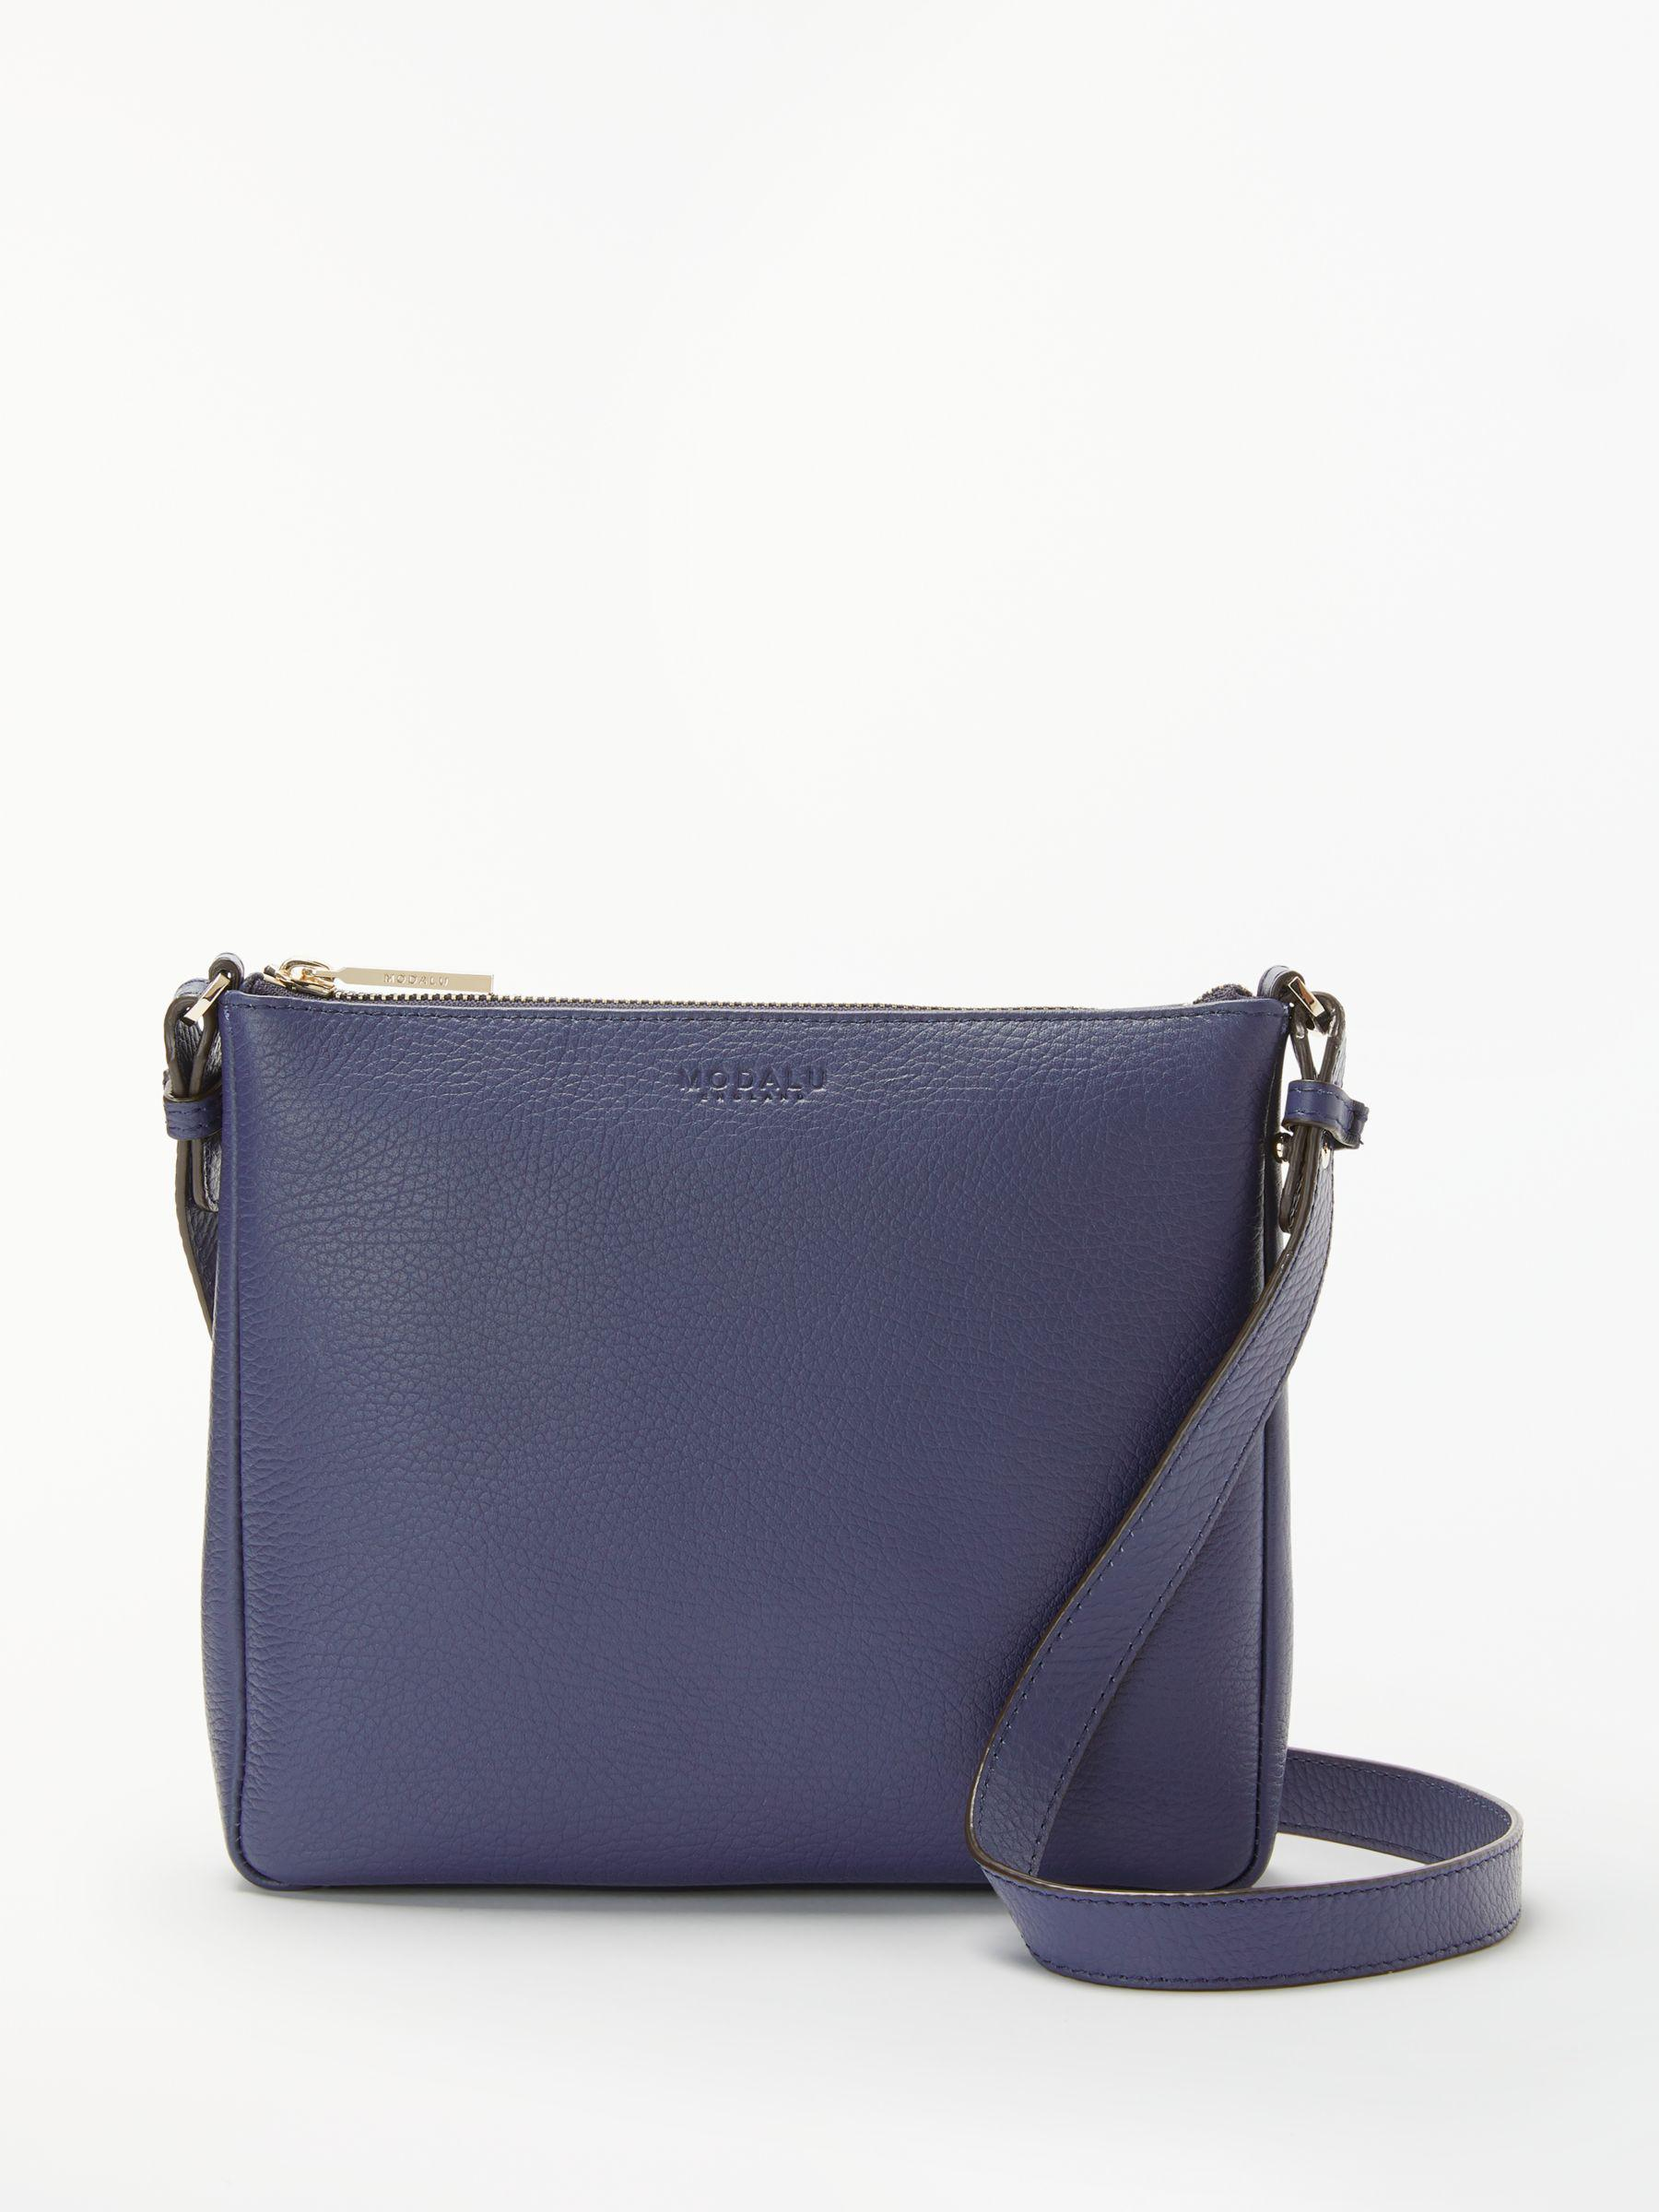 d5c6bf1c3288 Modalu Elsa Leather Cross Body Bag in Blue - Lyst